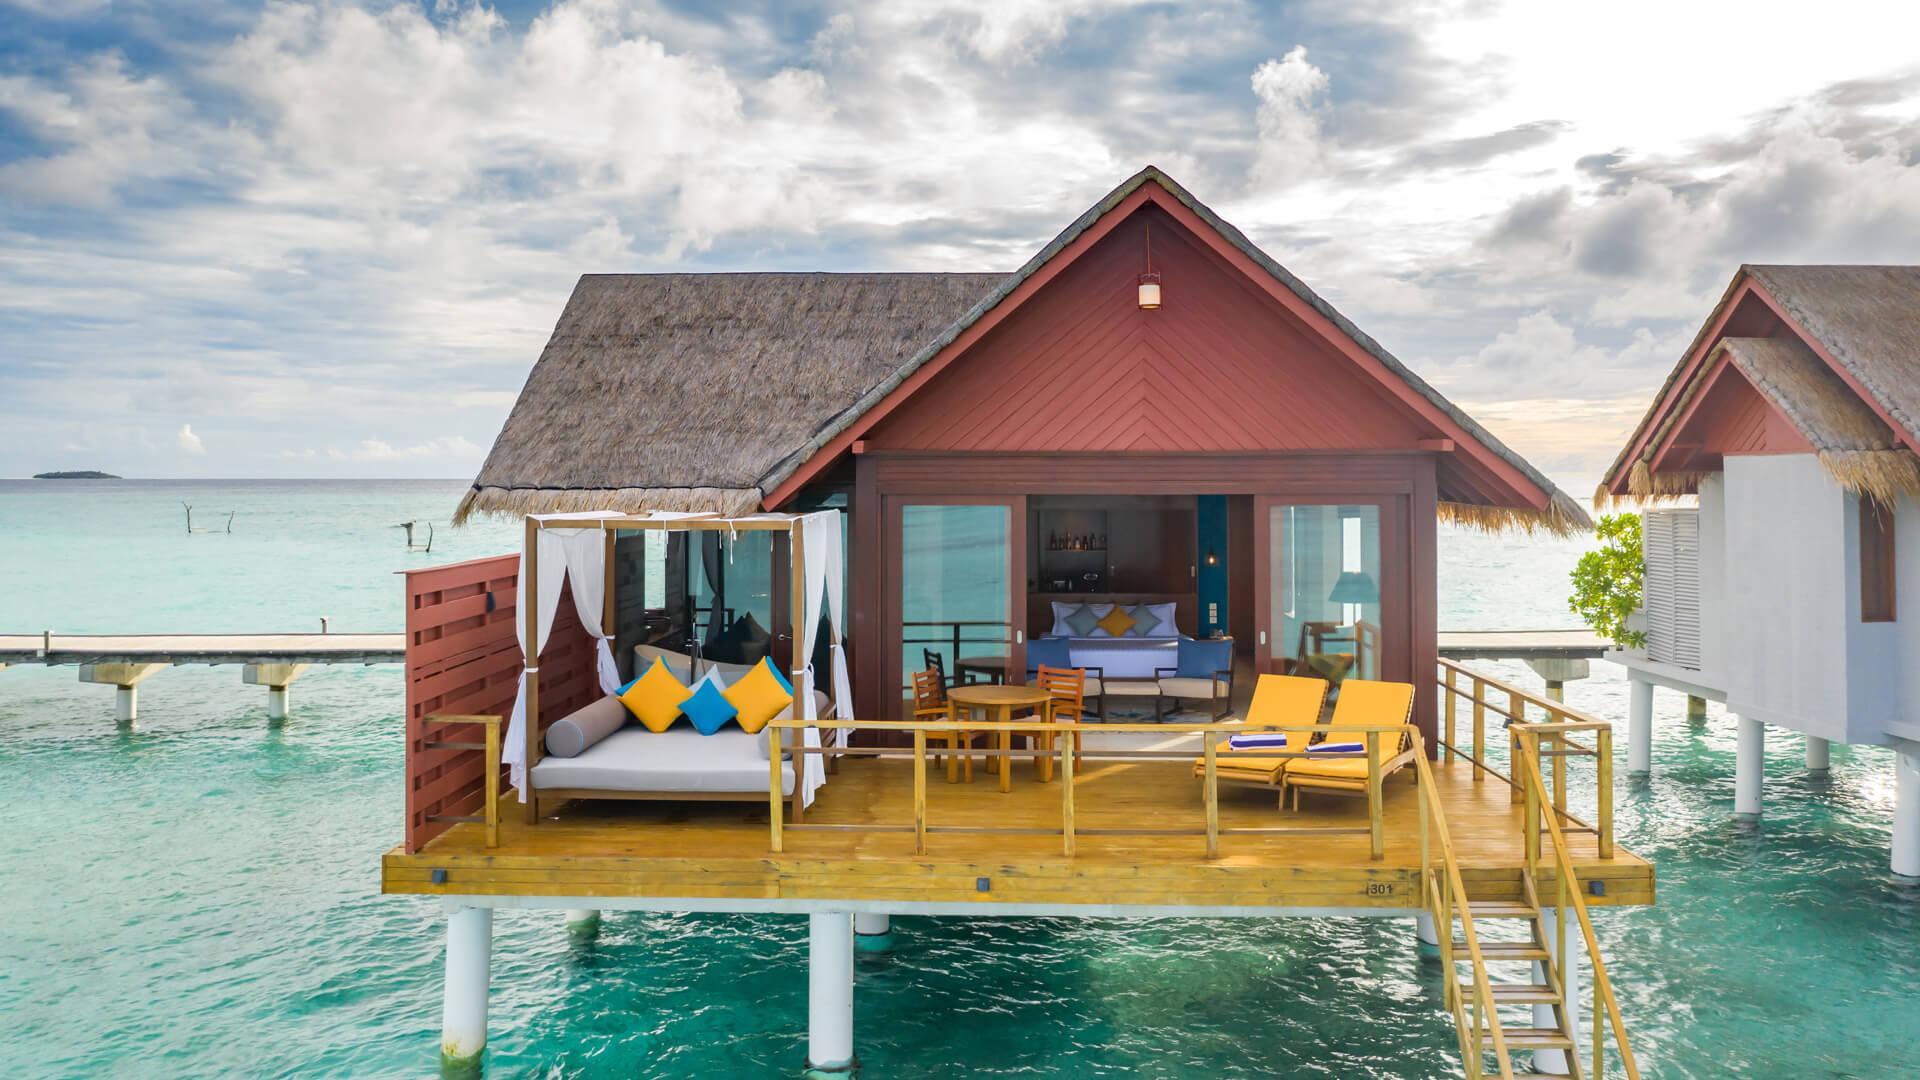 Furaveri Island Resort e Spa 5* - Foto di una palafitta dal mare